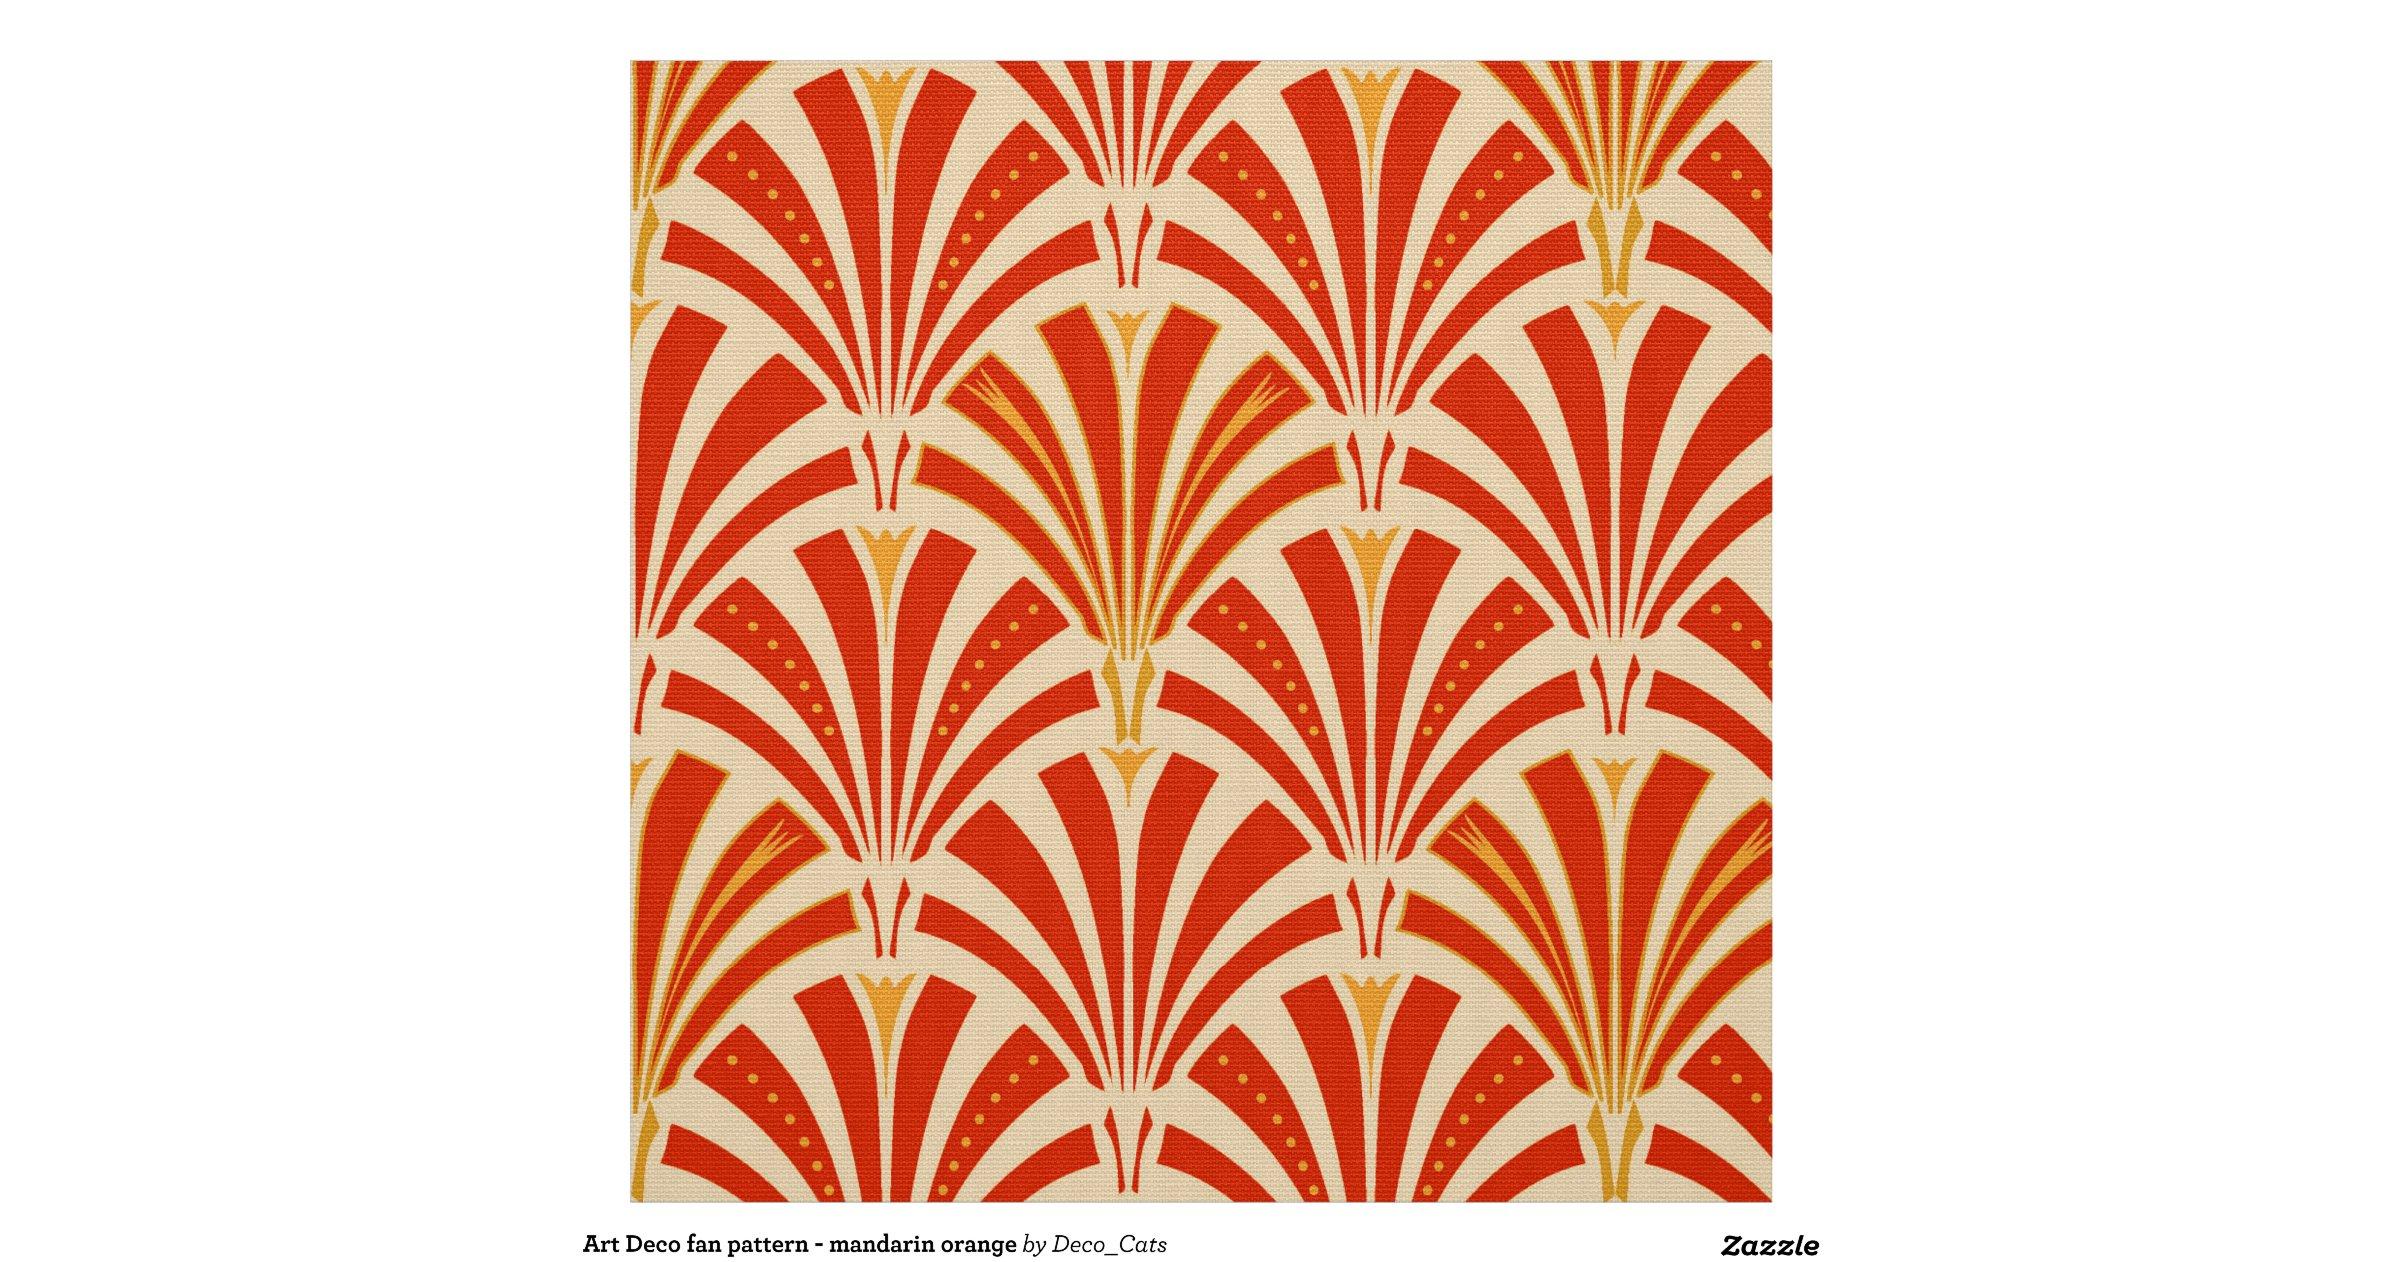 Art deco fan pattern mandarin orange fabric for Art deco fabric